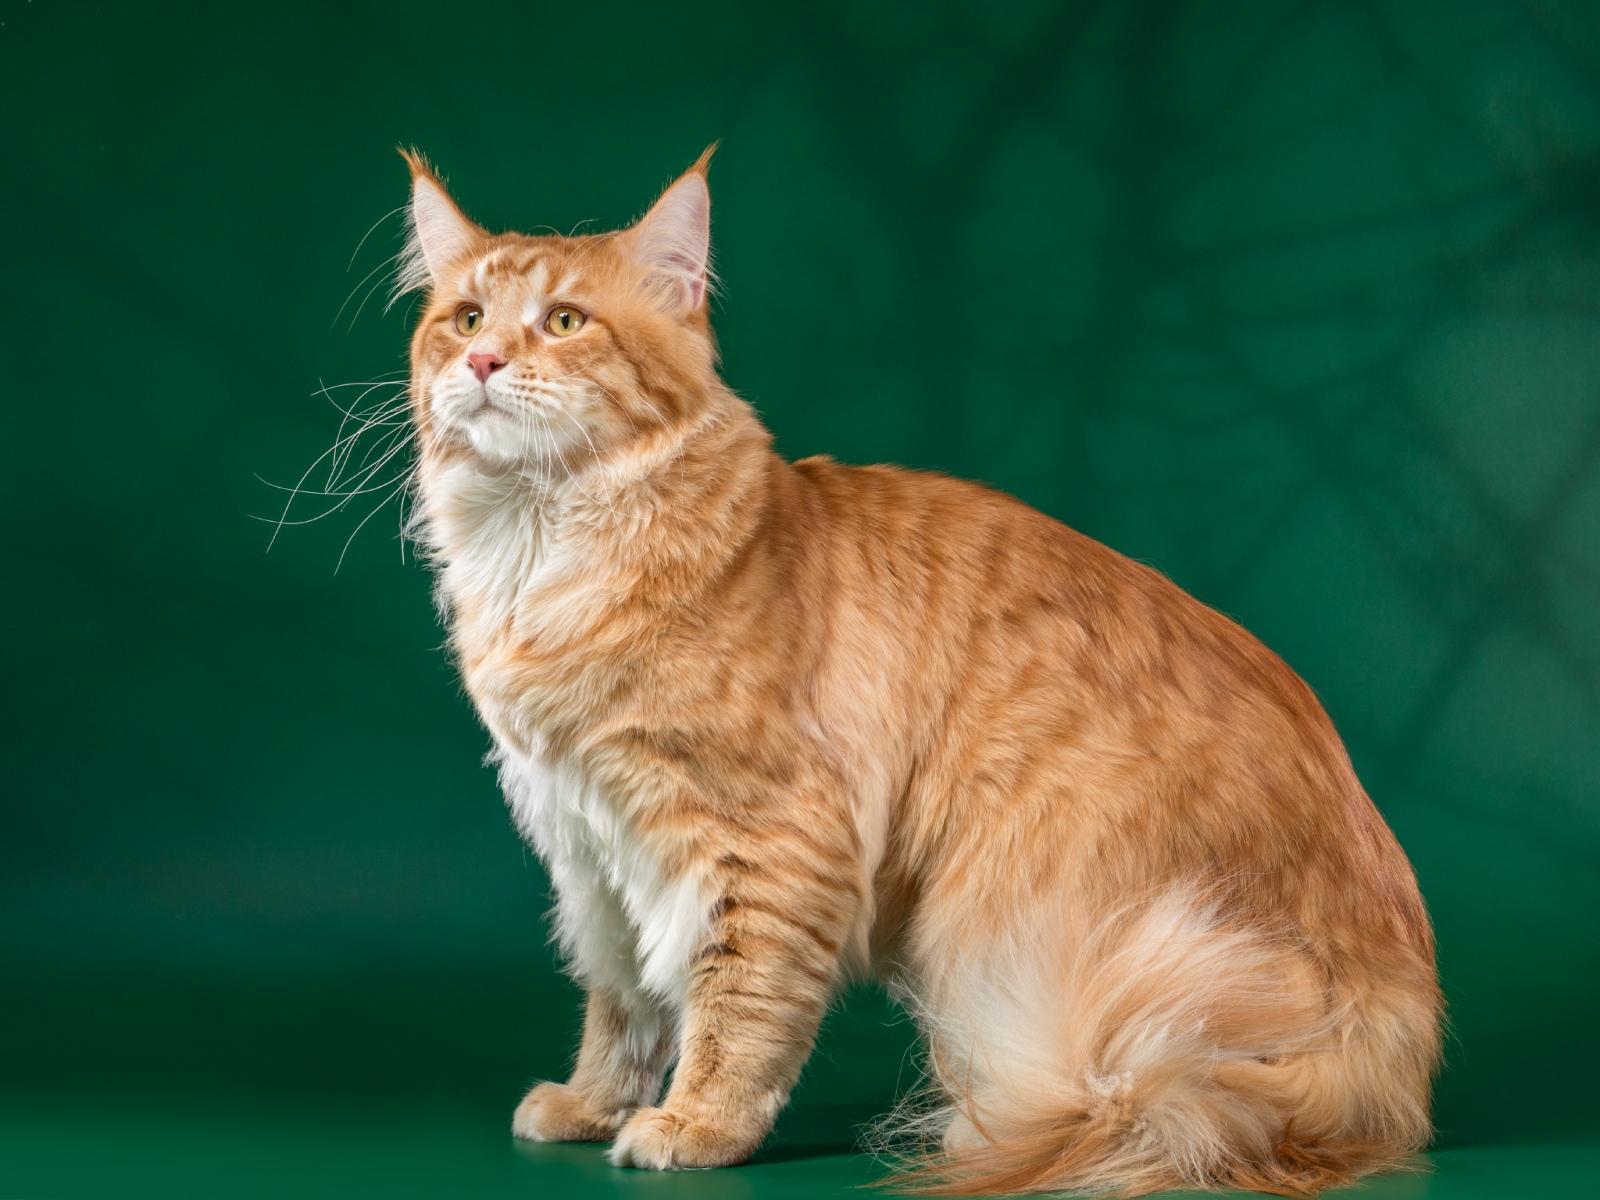 Кот на вязку - Yosia Richard Gold King (MCO d 23) 2